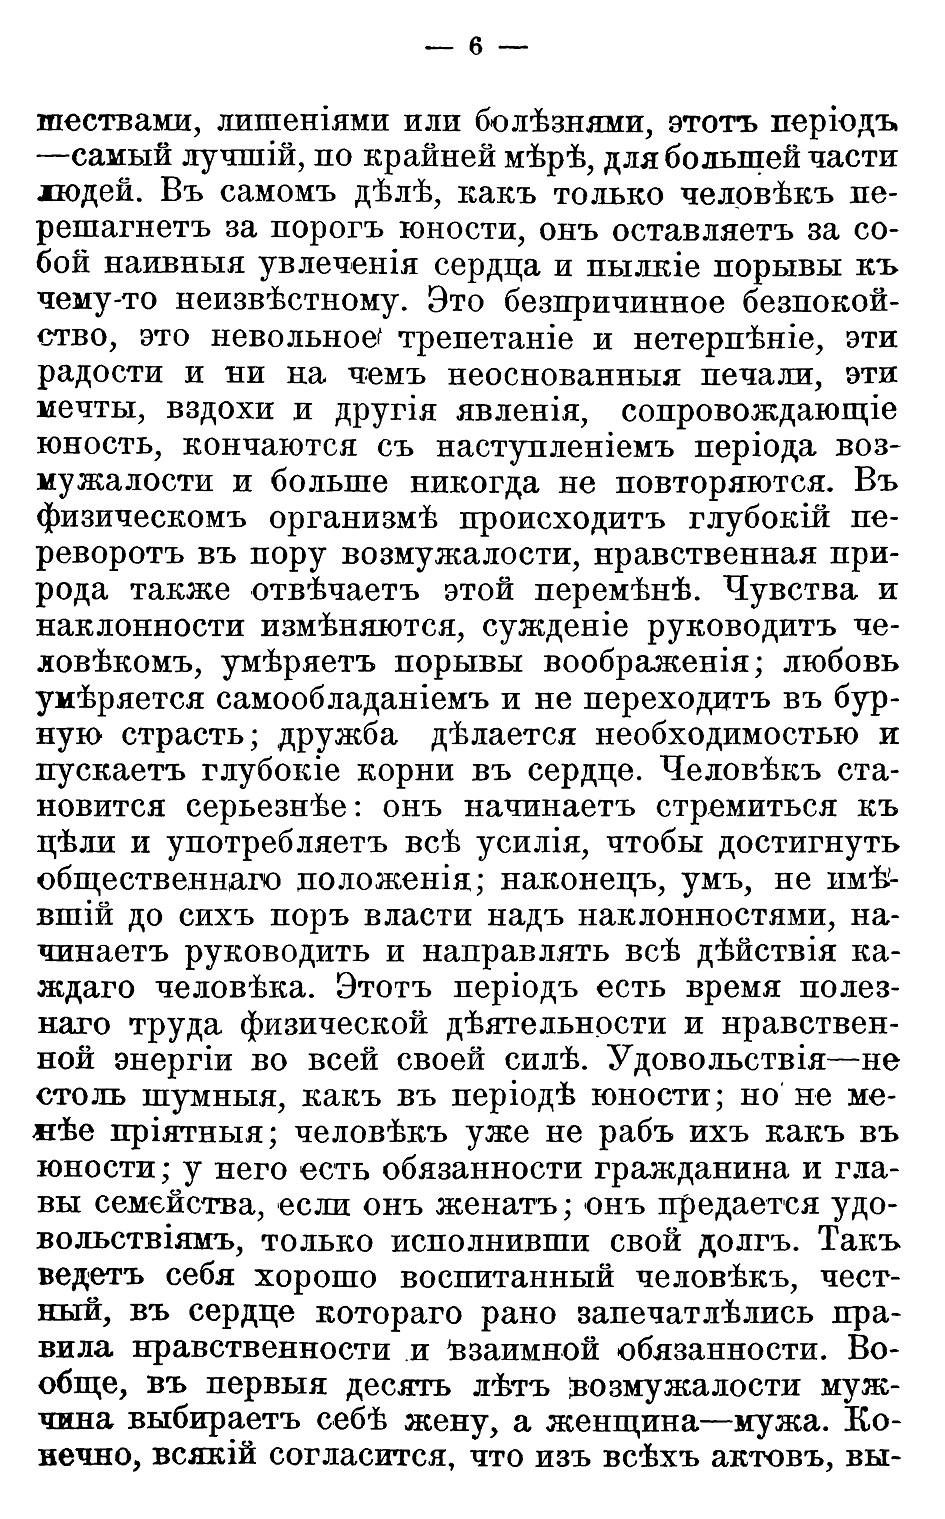 http://i2.imageban.ru/out/2014/02/14/9c2902814d8114b24b1a82d677e7a1ce.jpg